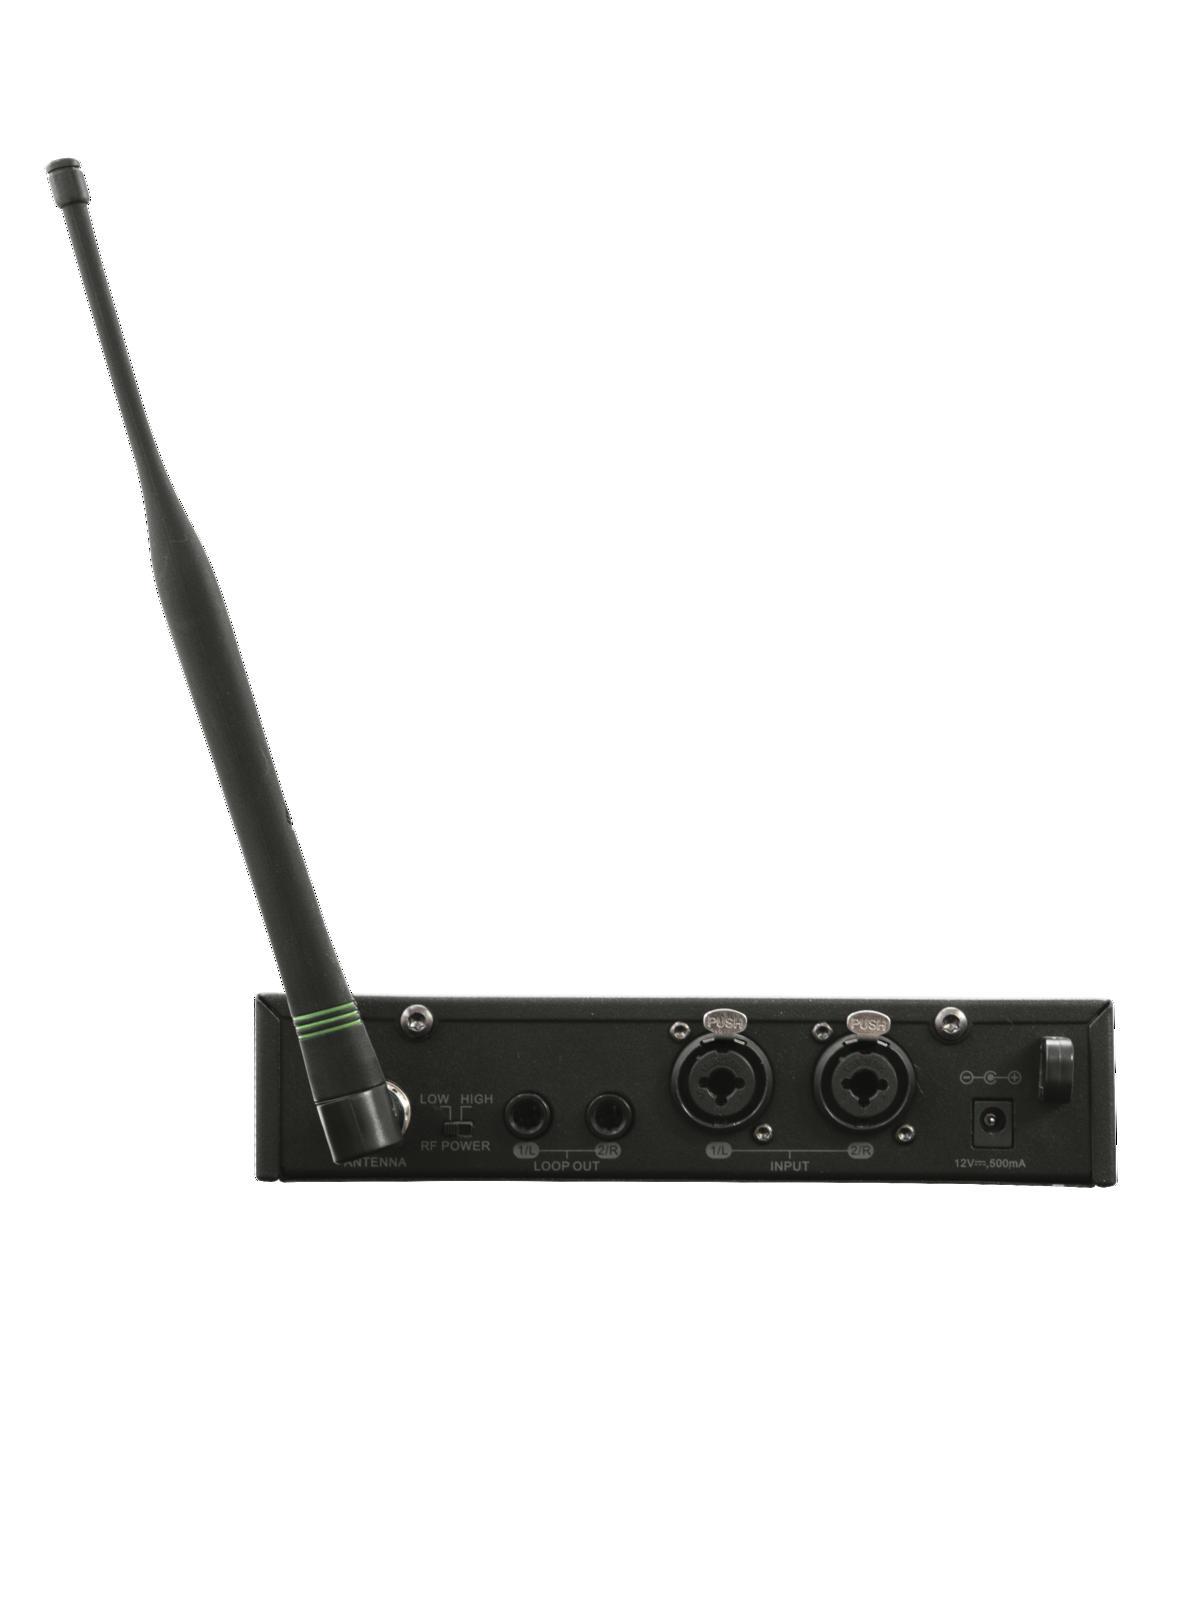 RELACART PM-160 Diversity In-Ear Sender